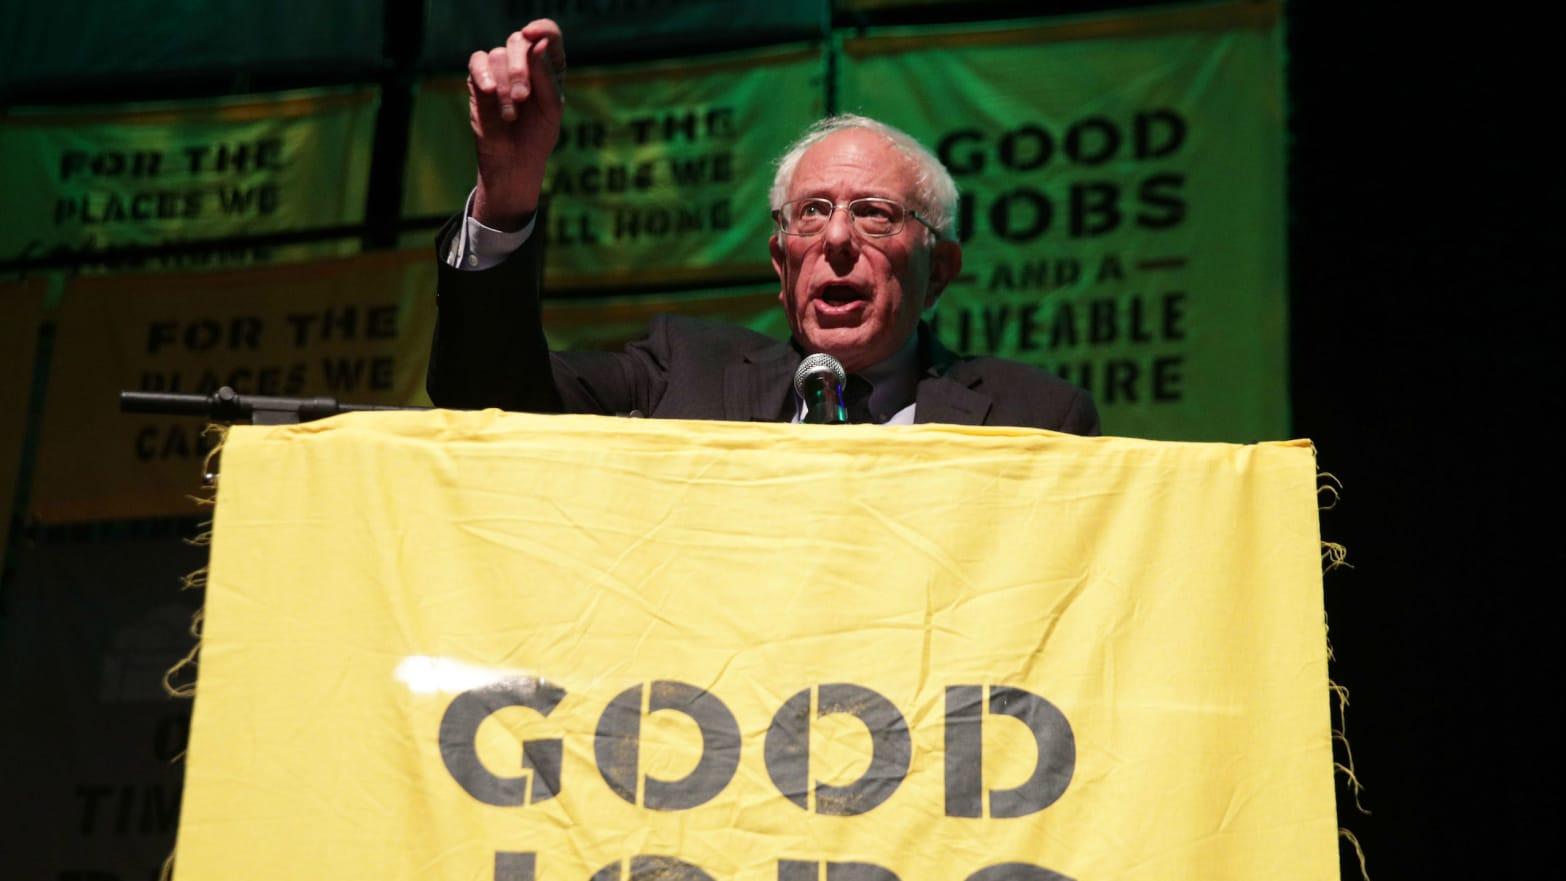 Bernie Sanders Calls for Ban on For-Profit Charter Schools, $60K Minimum Salary for Teachers